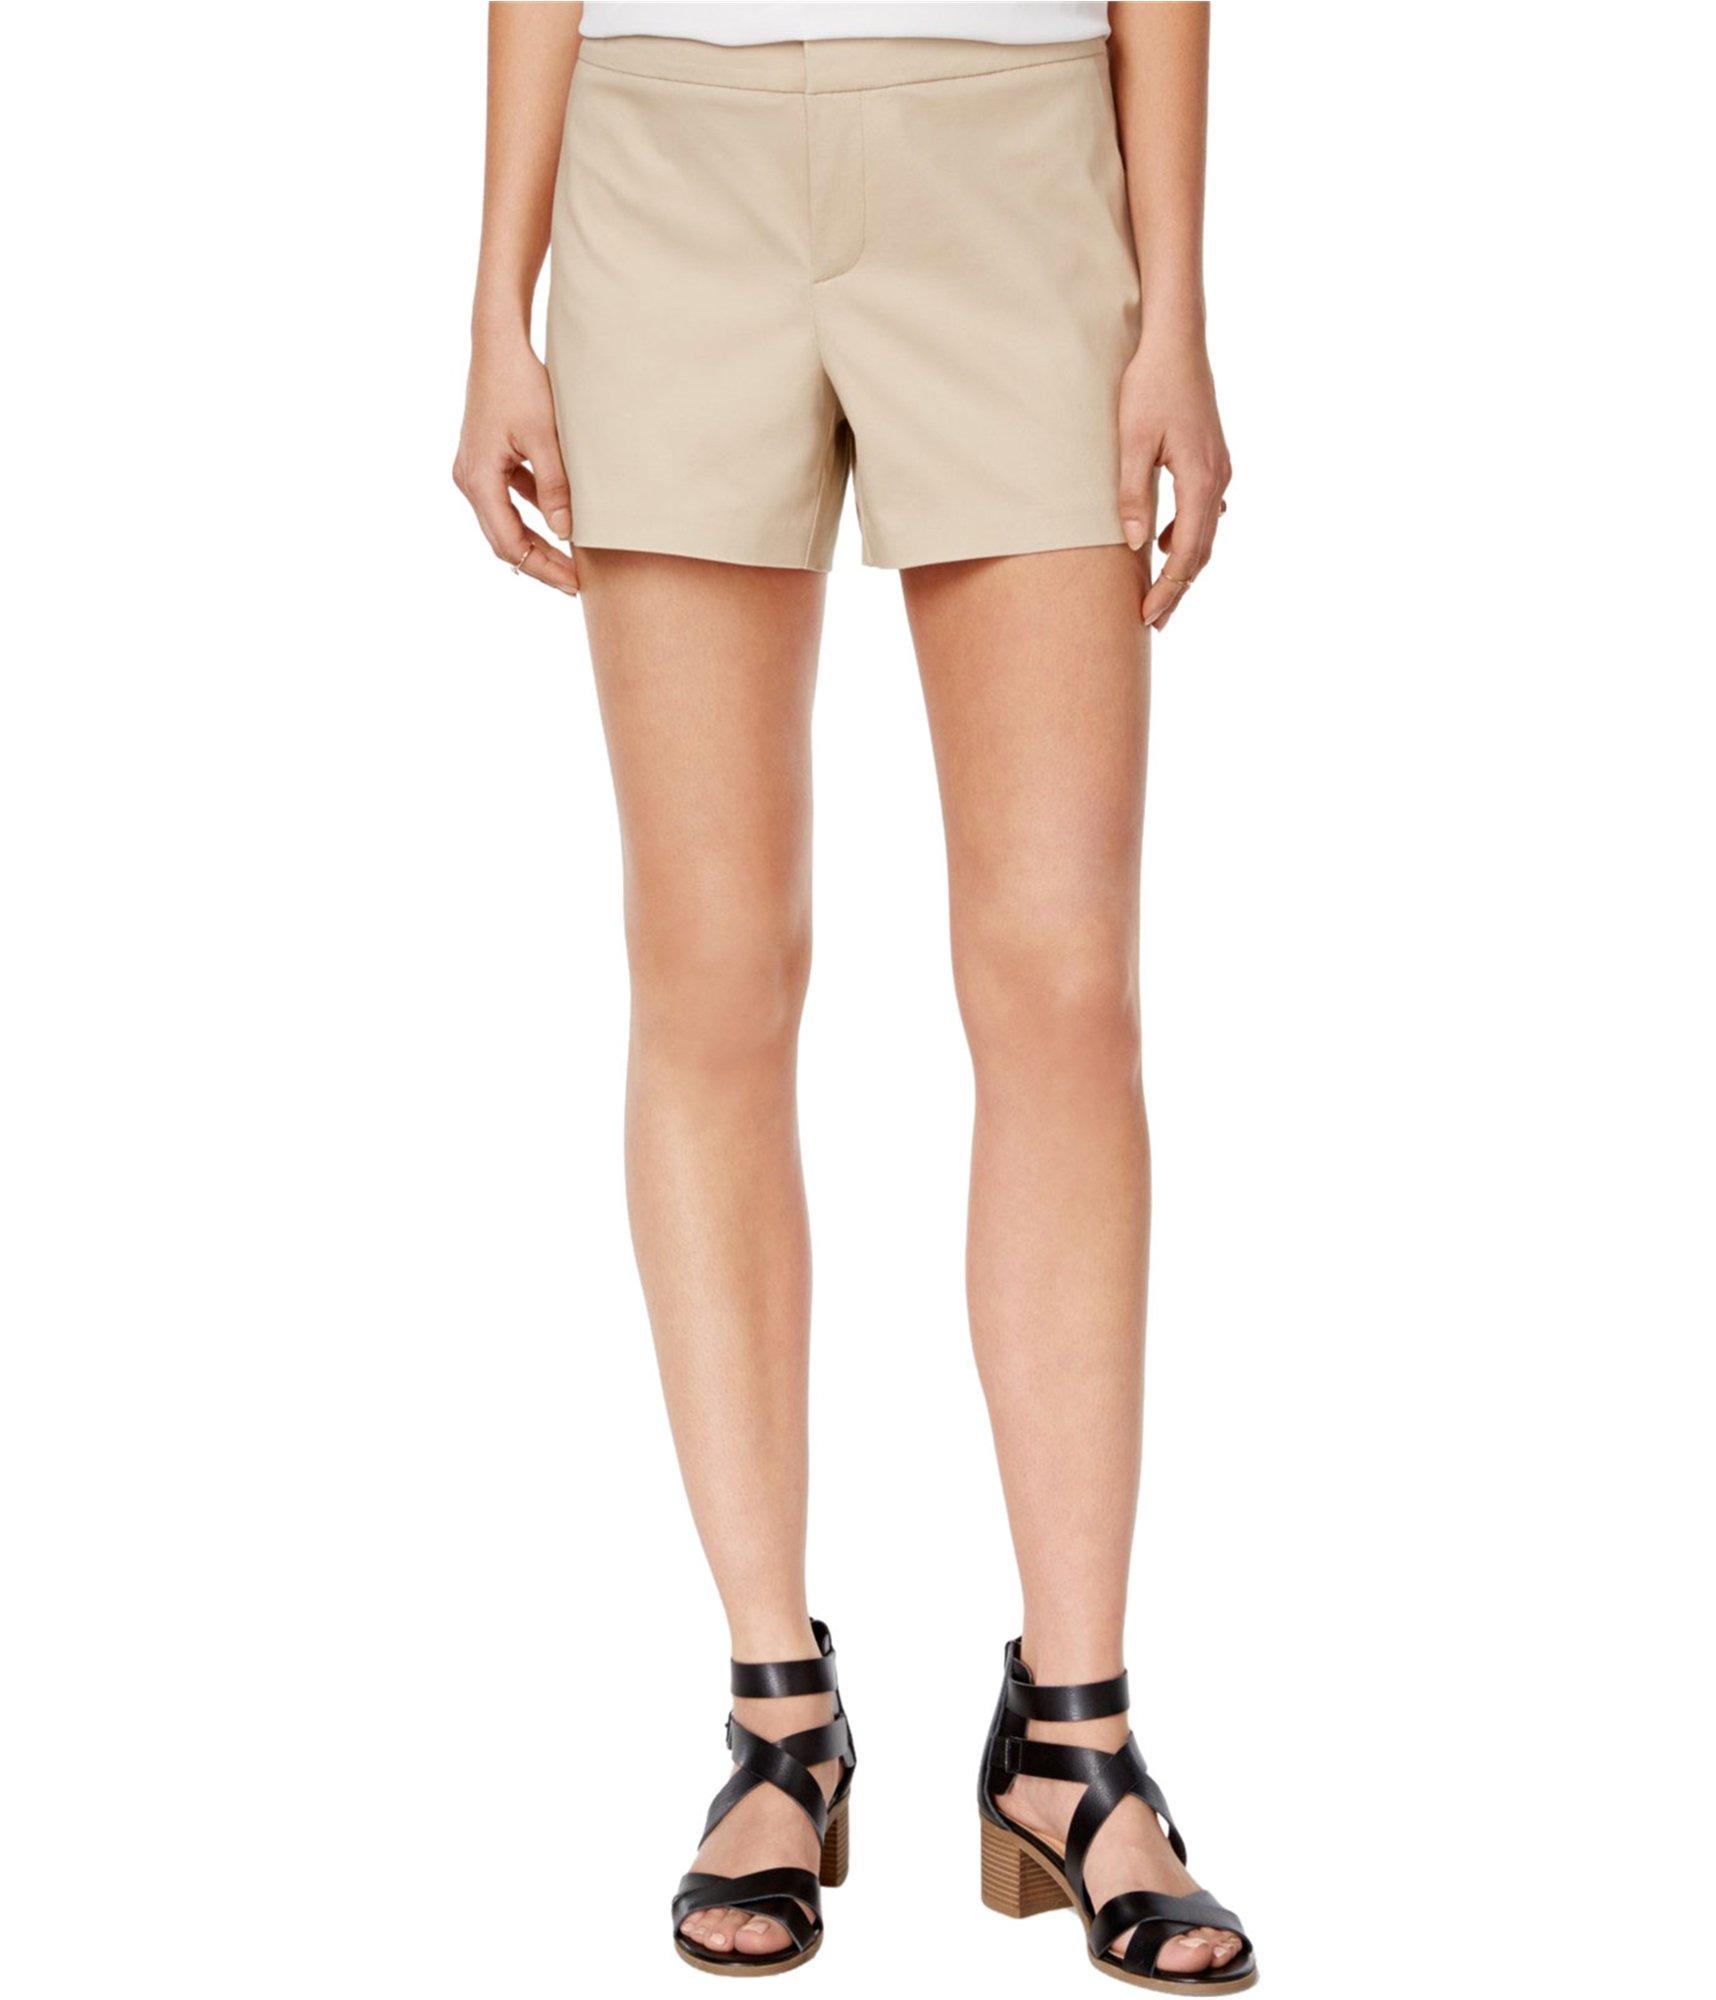 Maison Jules Shorts Oxford Tan Size 14